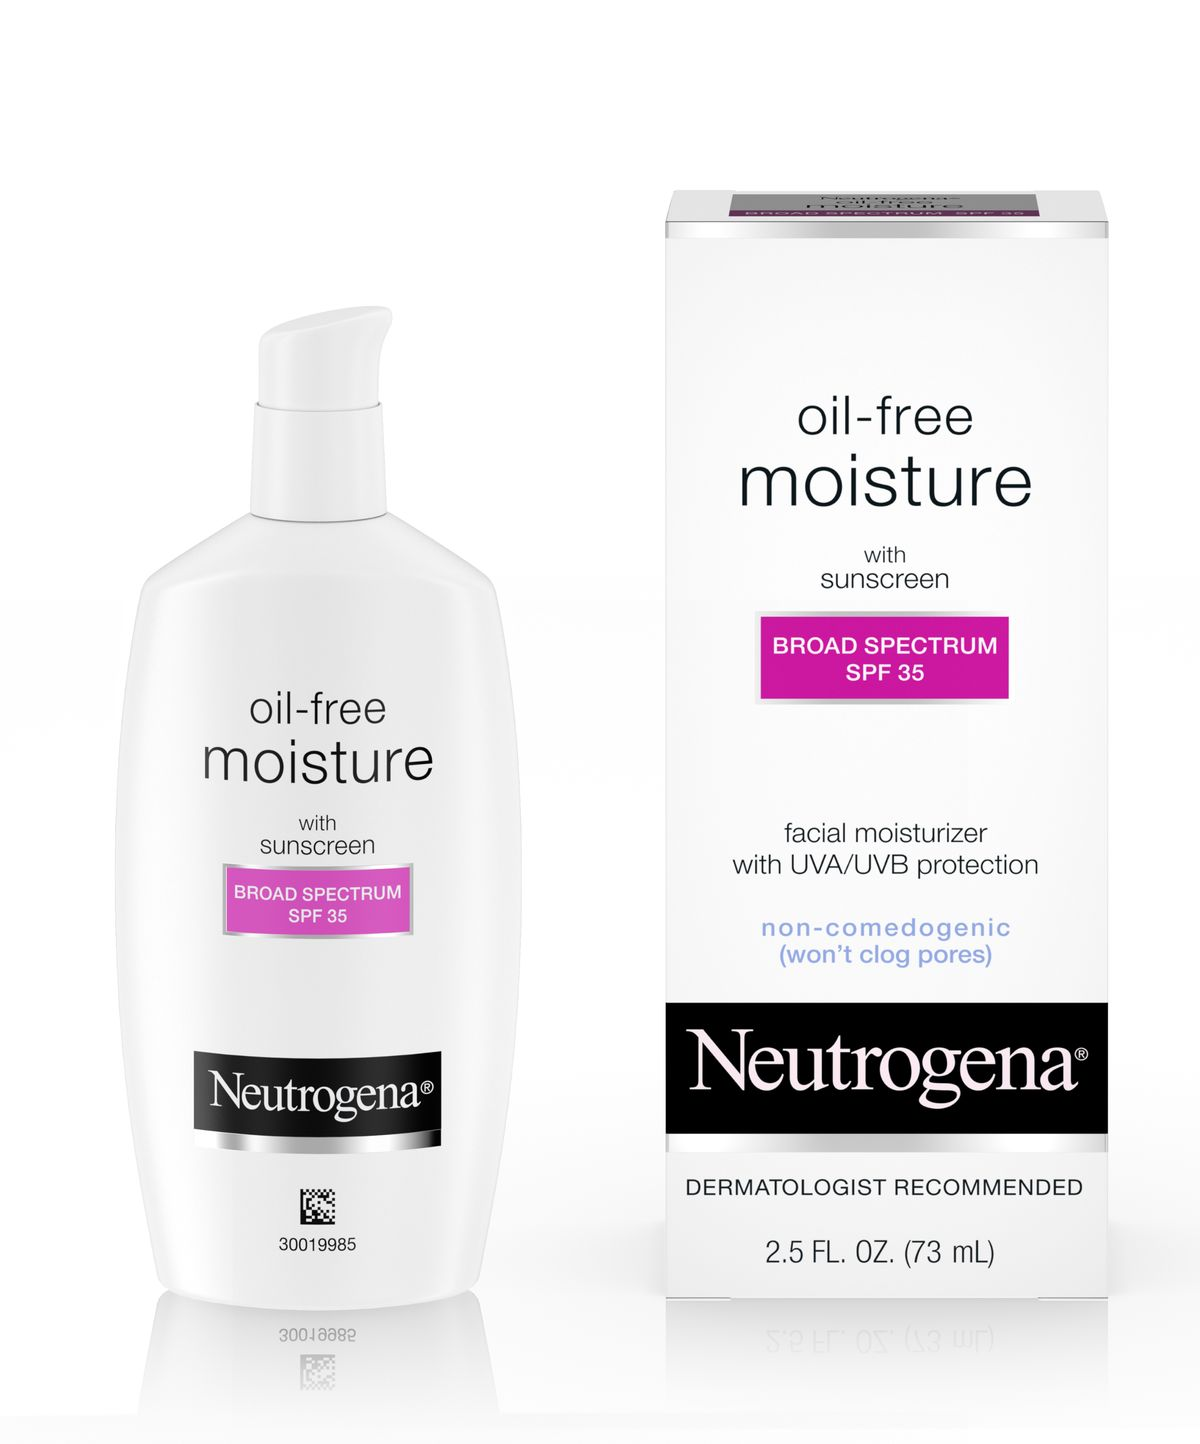 Neutrogena Oil-Free Moisturizer SPF 35.jpg